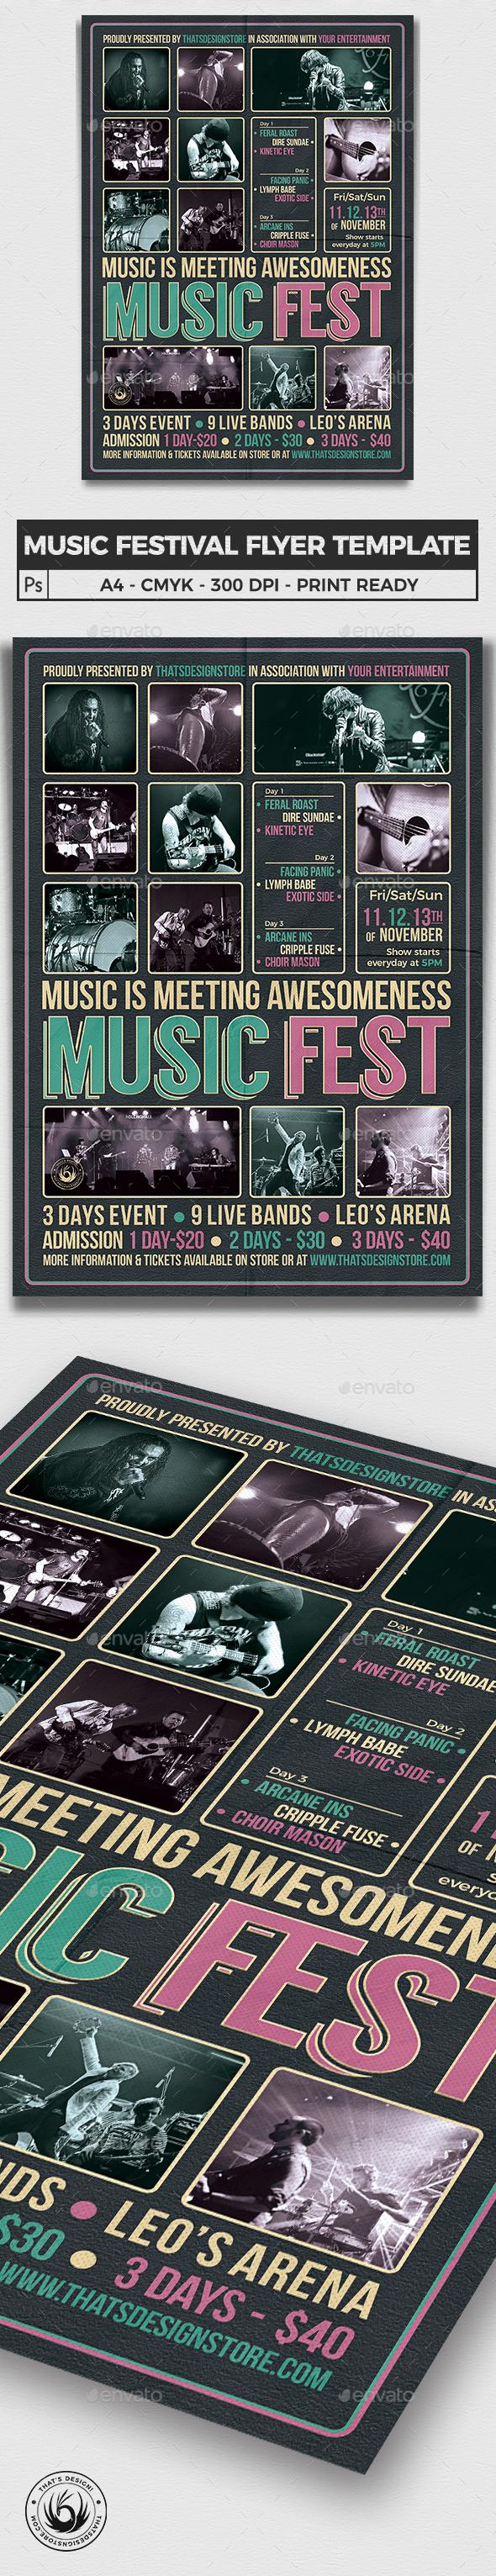 Music Festival Flyer Template V8 - Concerts Events